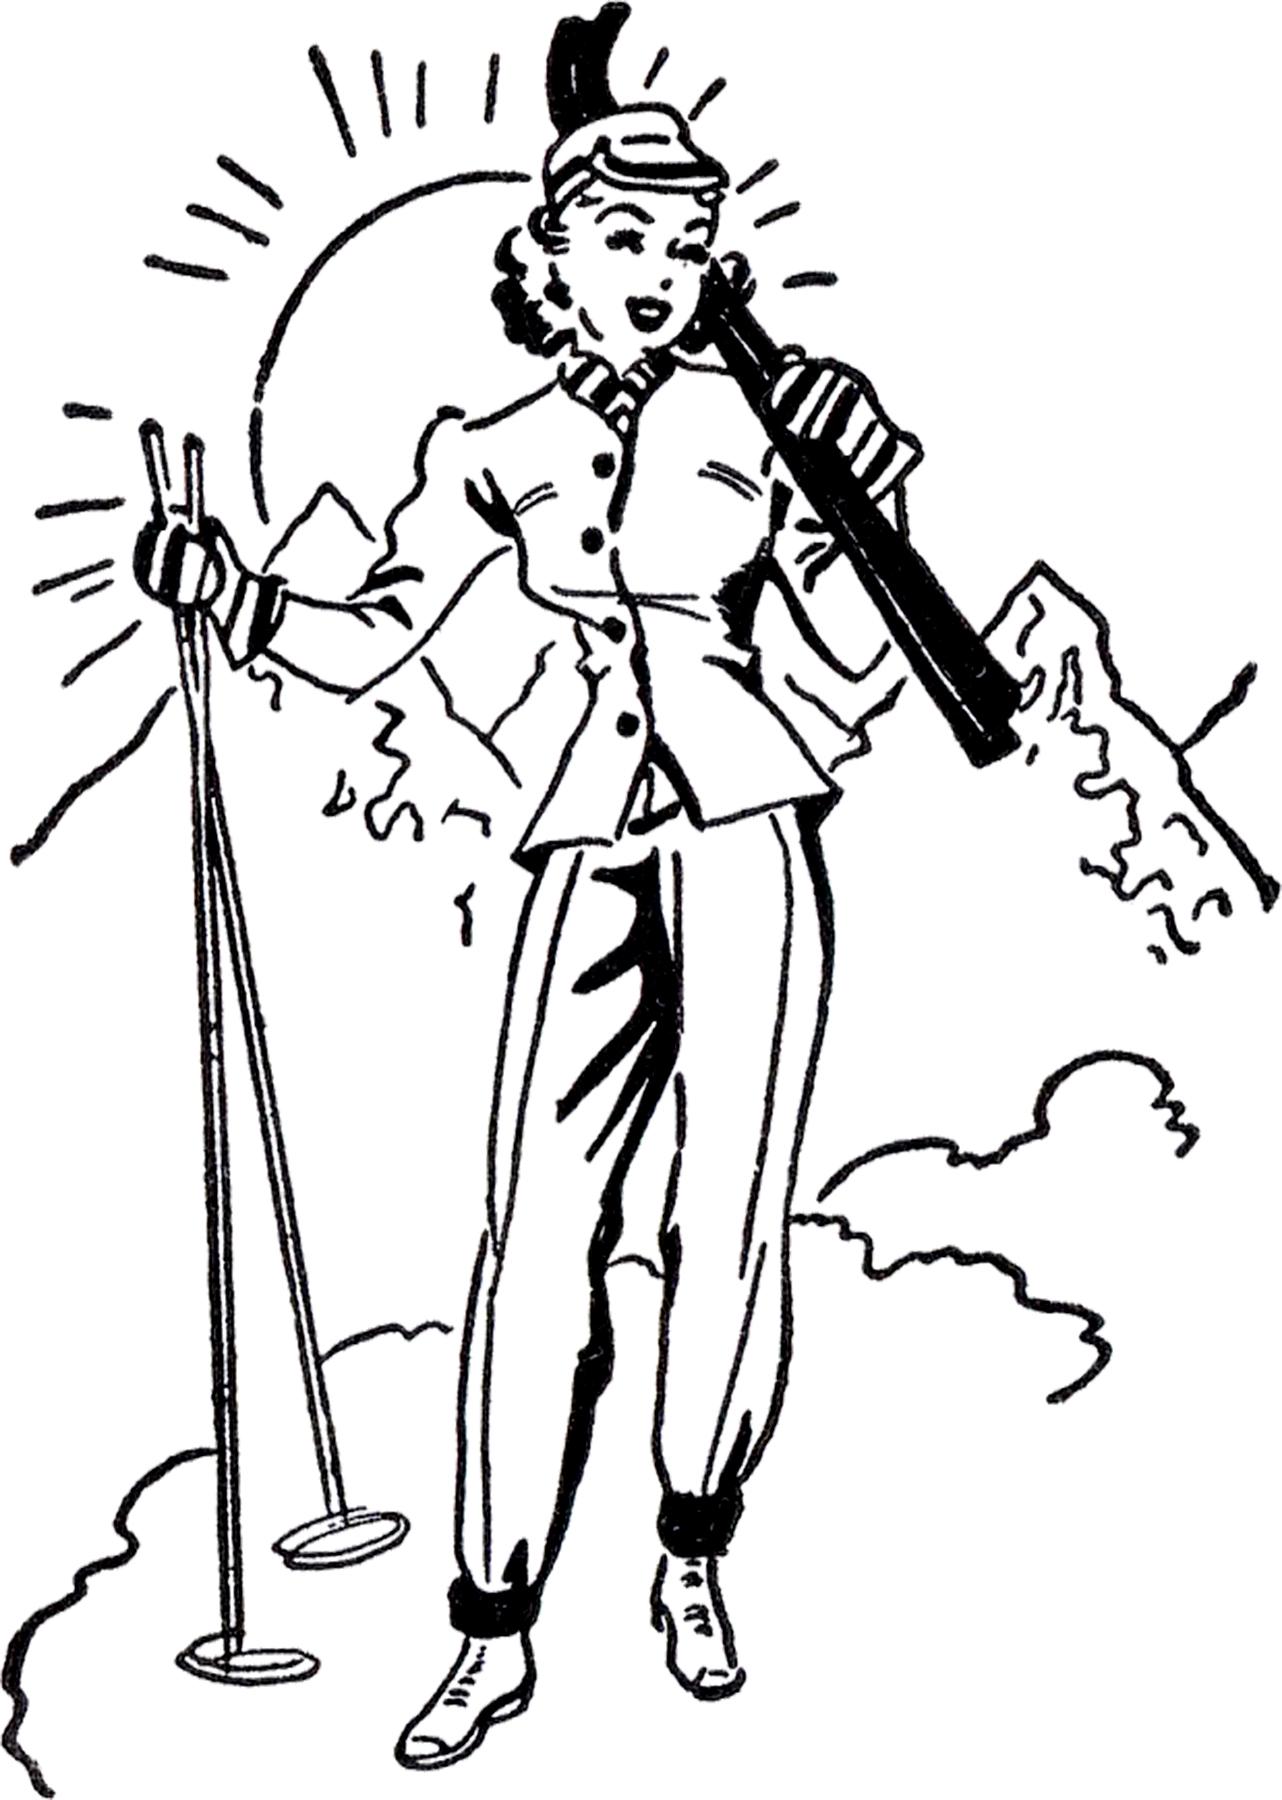 Retro Ski Lady Image